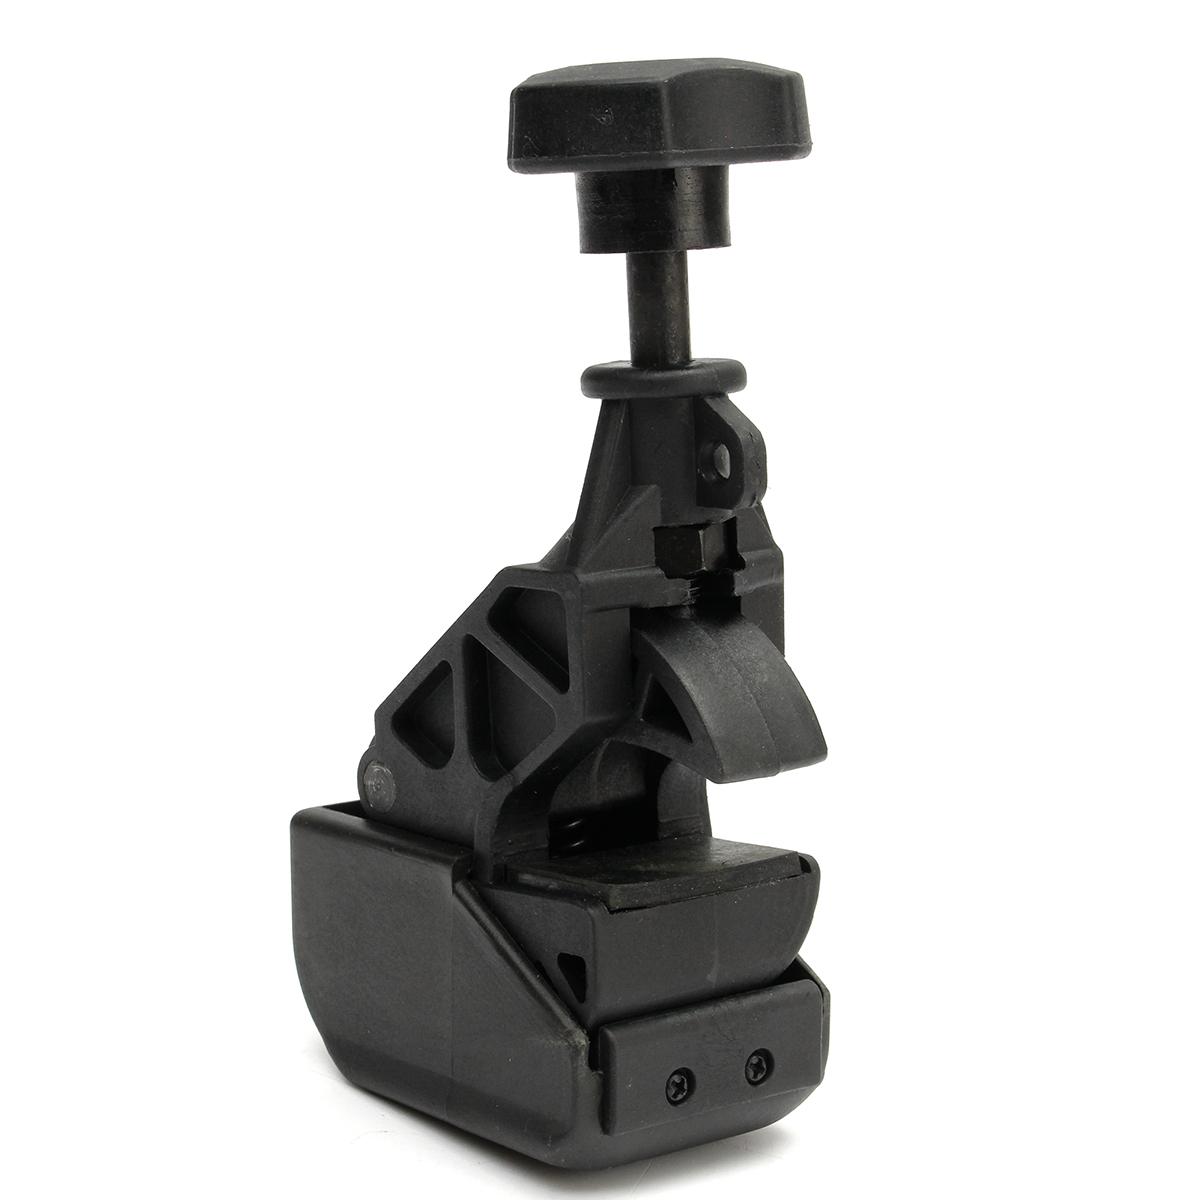 Nylon Tire Changer Bead Clamp Drop Center Tool Rim Clamp Heavy Duty Machine